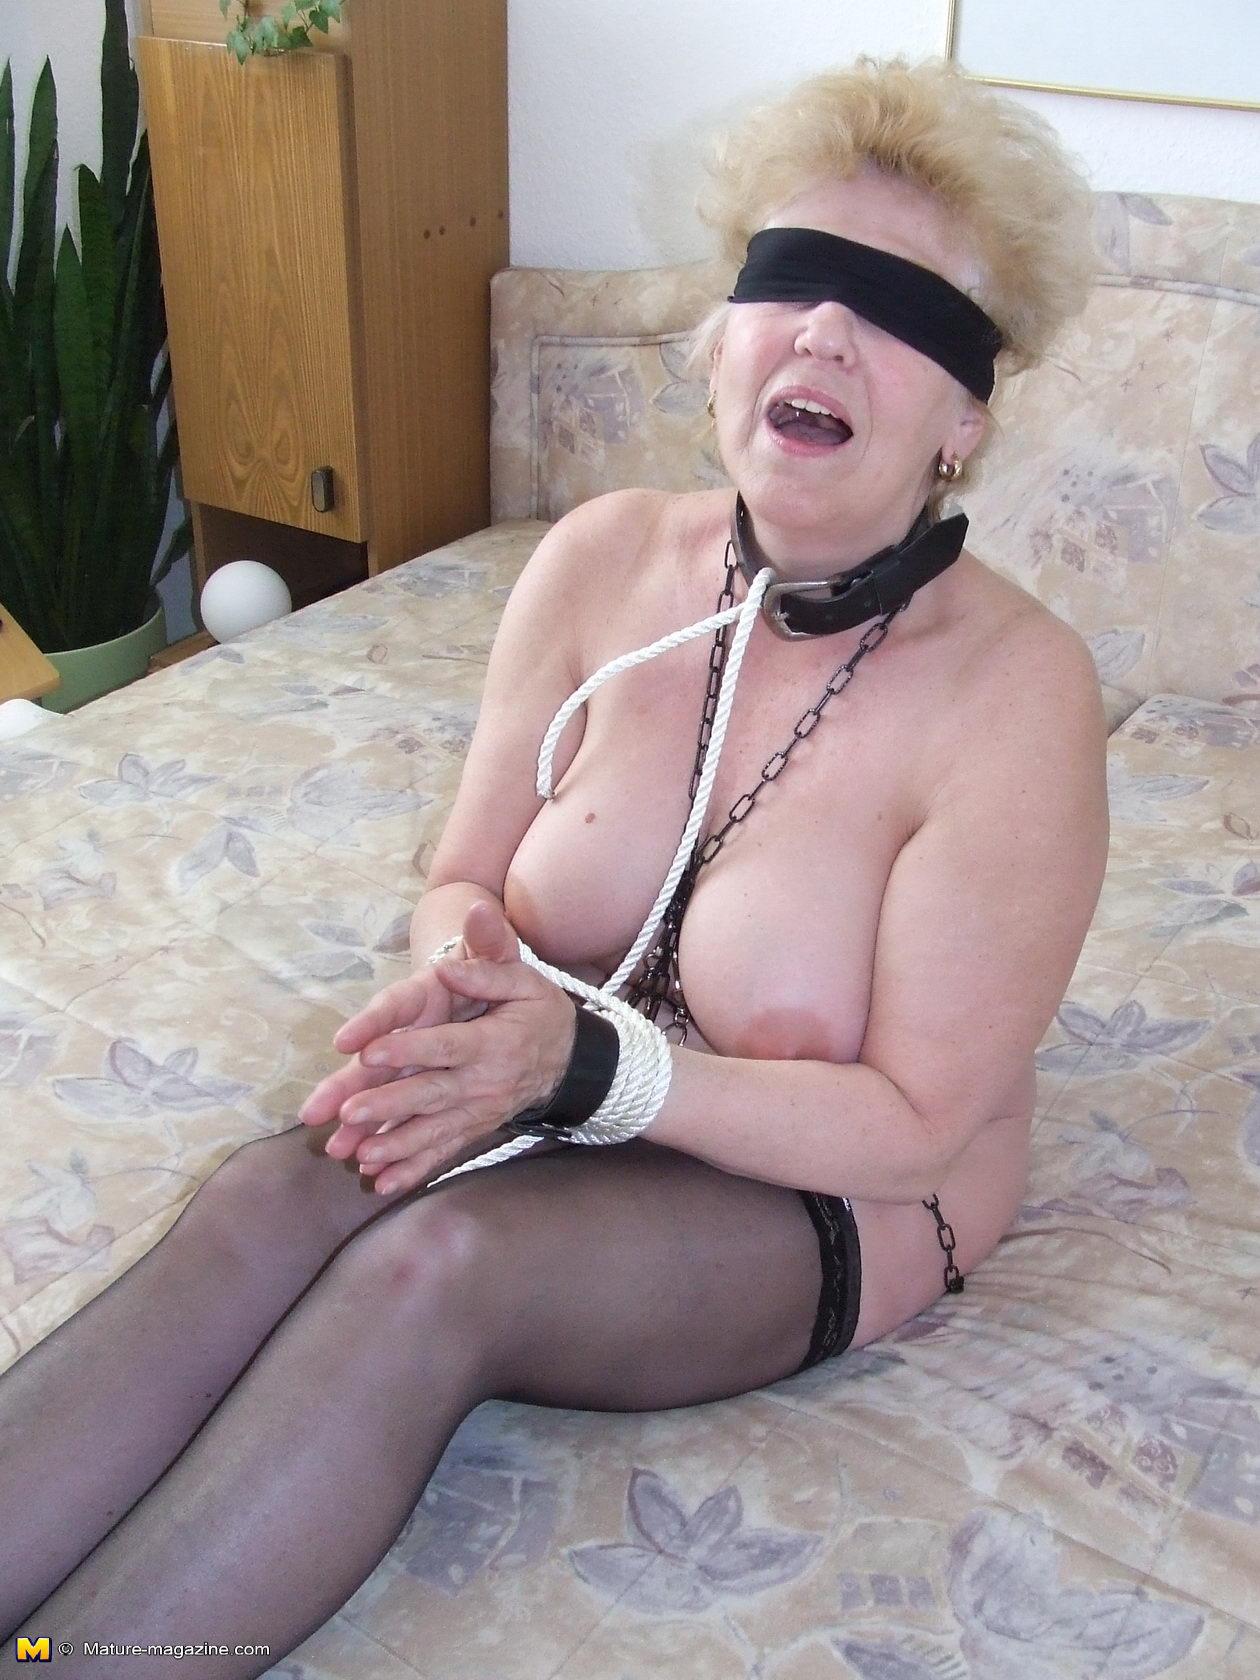 All Granny Porn kinky granny loves to get tied up - grannypornpics